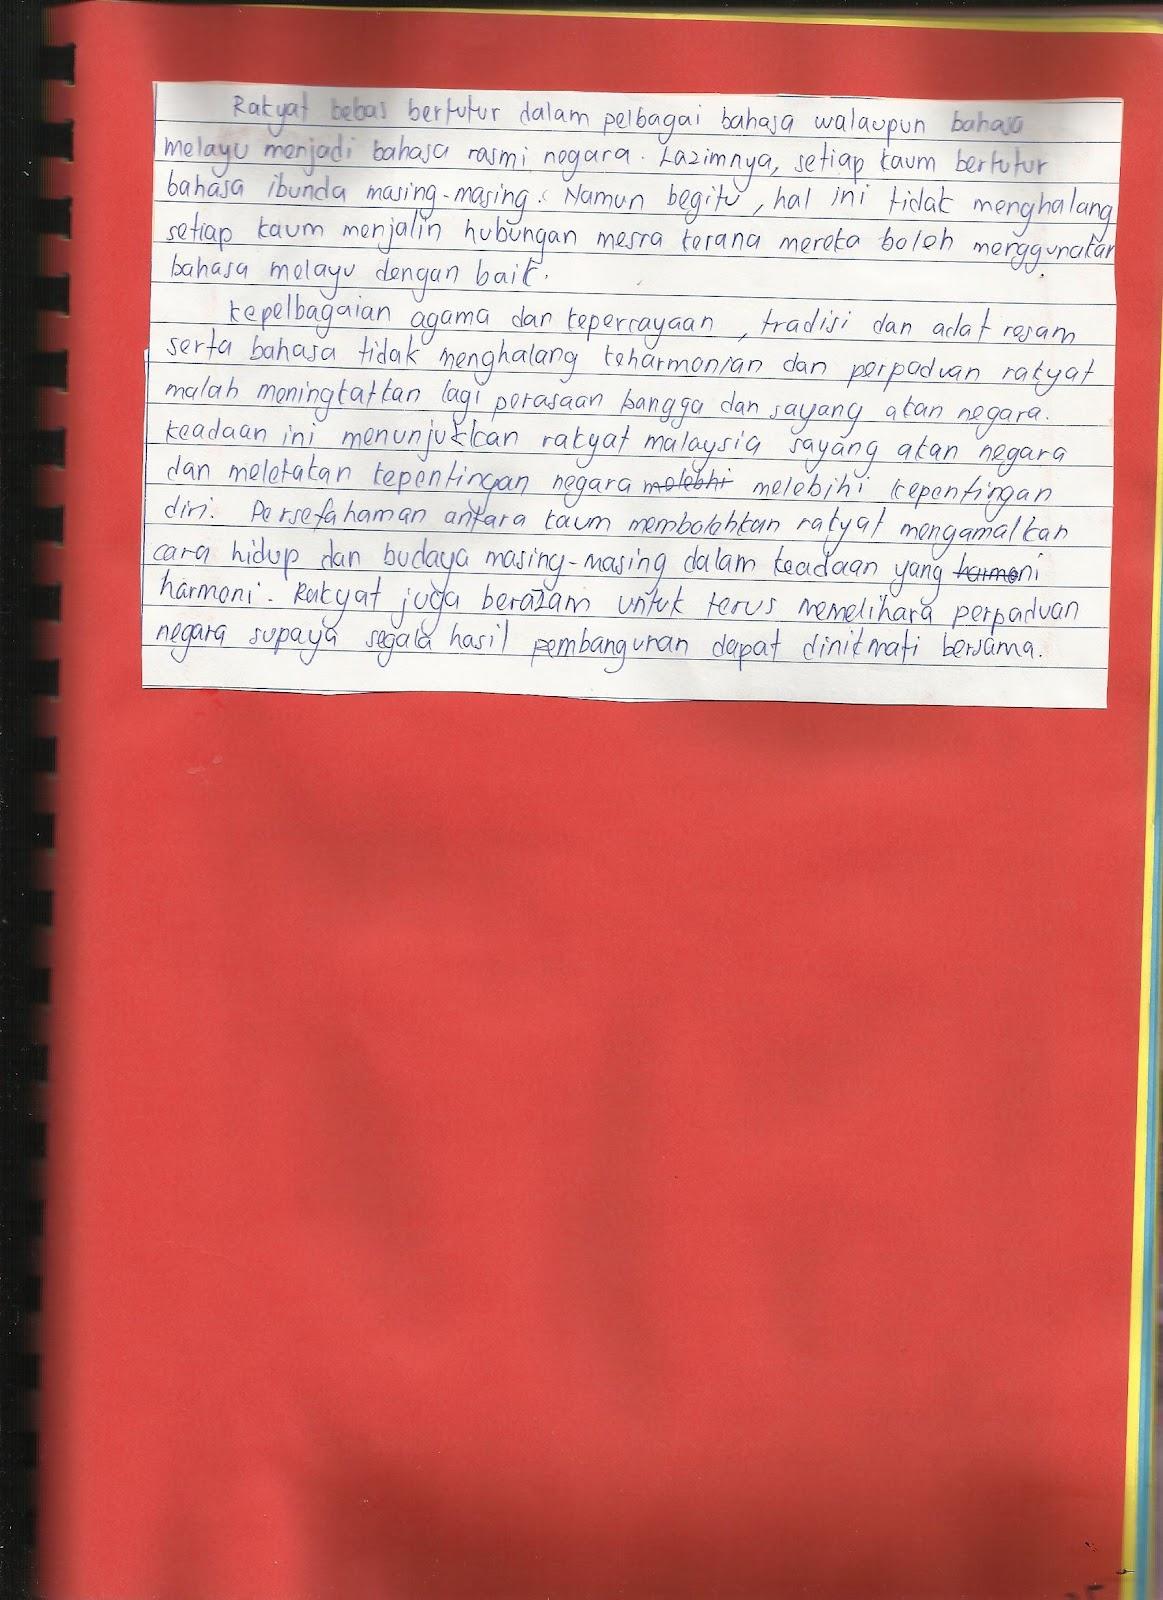 Moral Essay Essay Morals Essay Morality Essay Faw Ip Essay On Moral